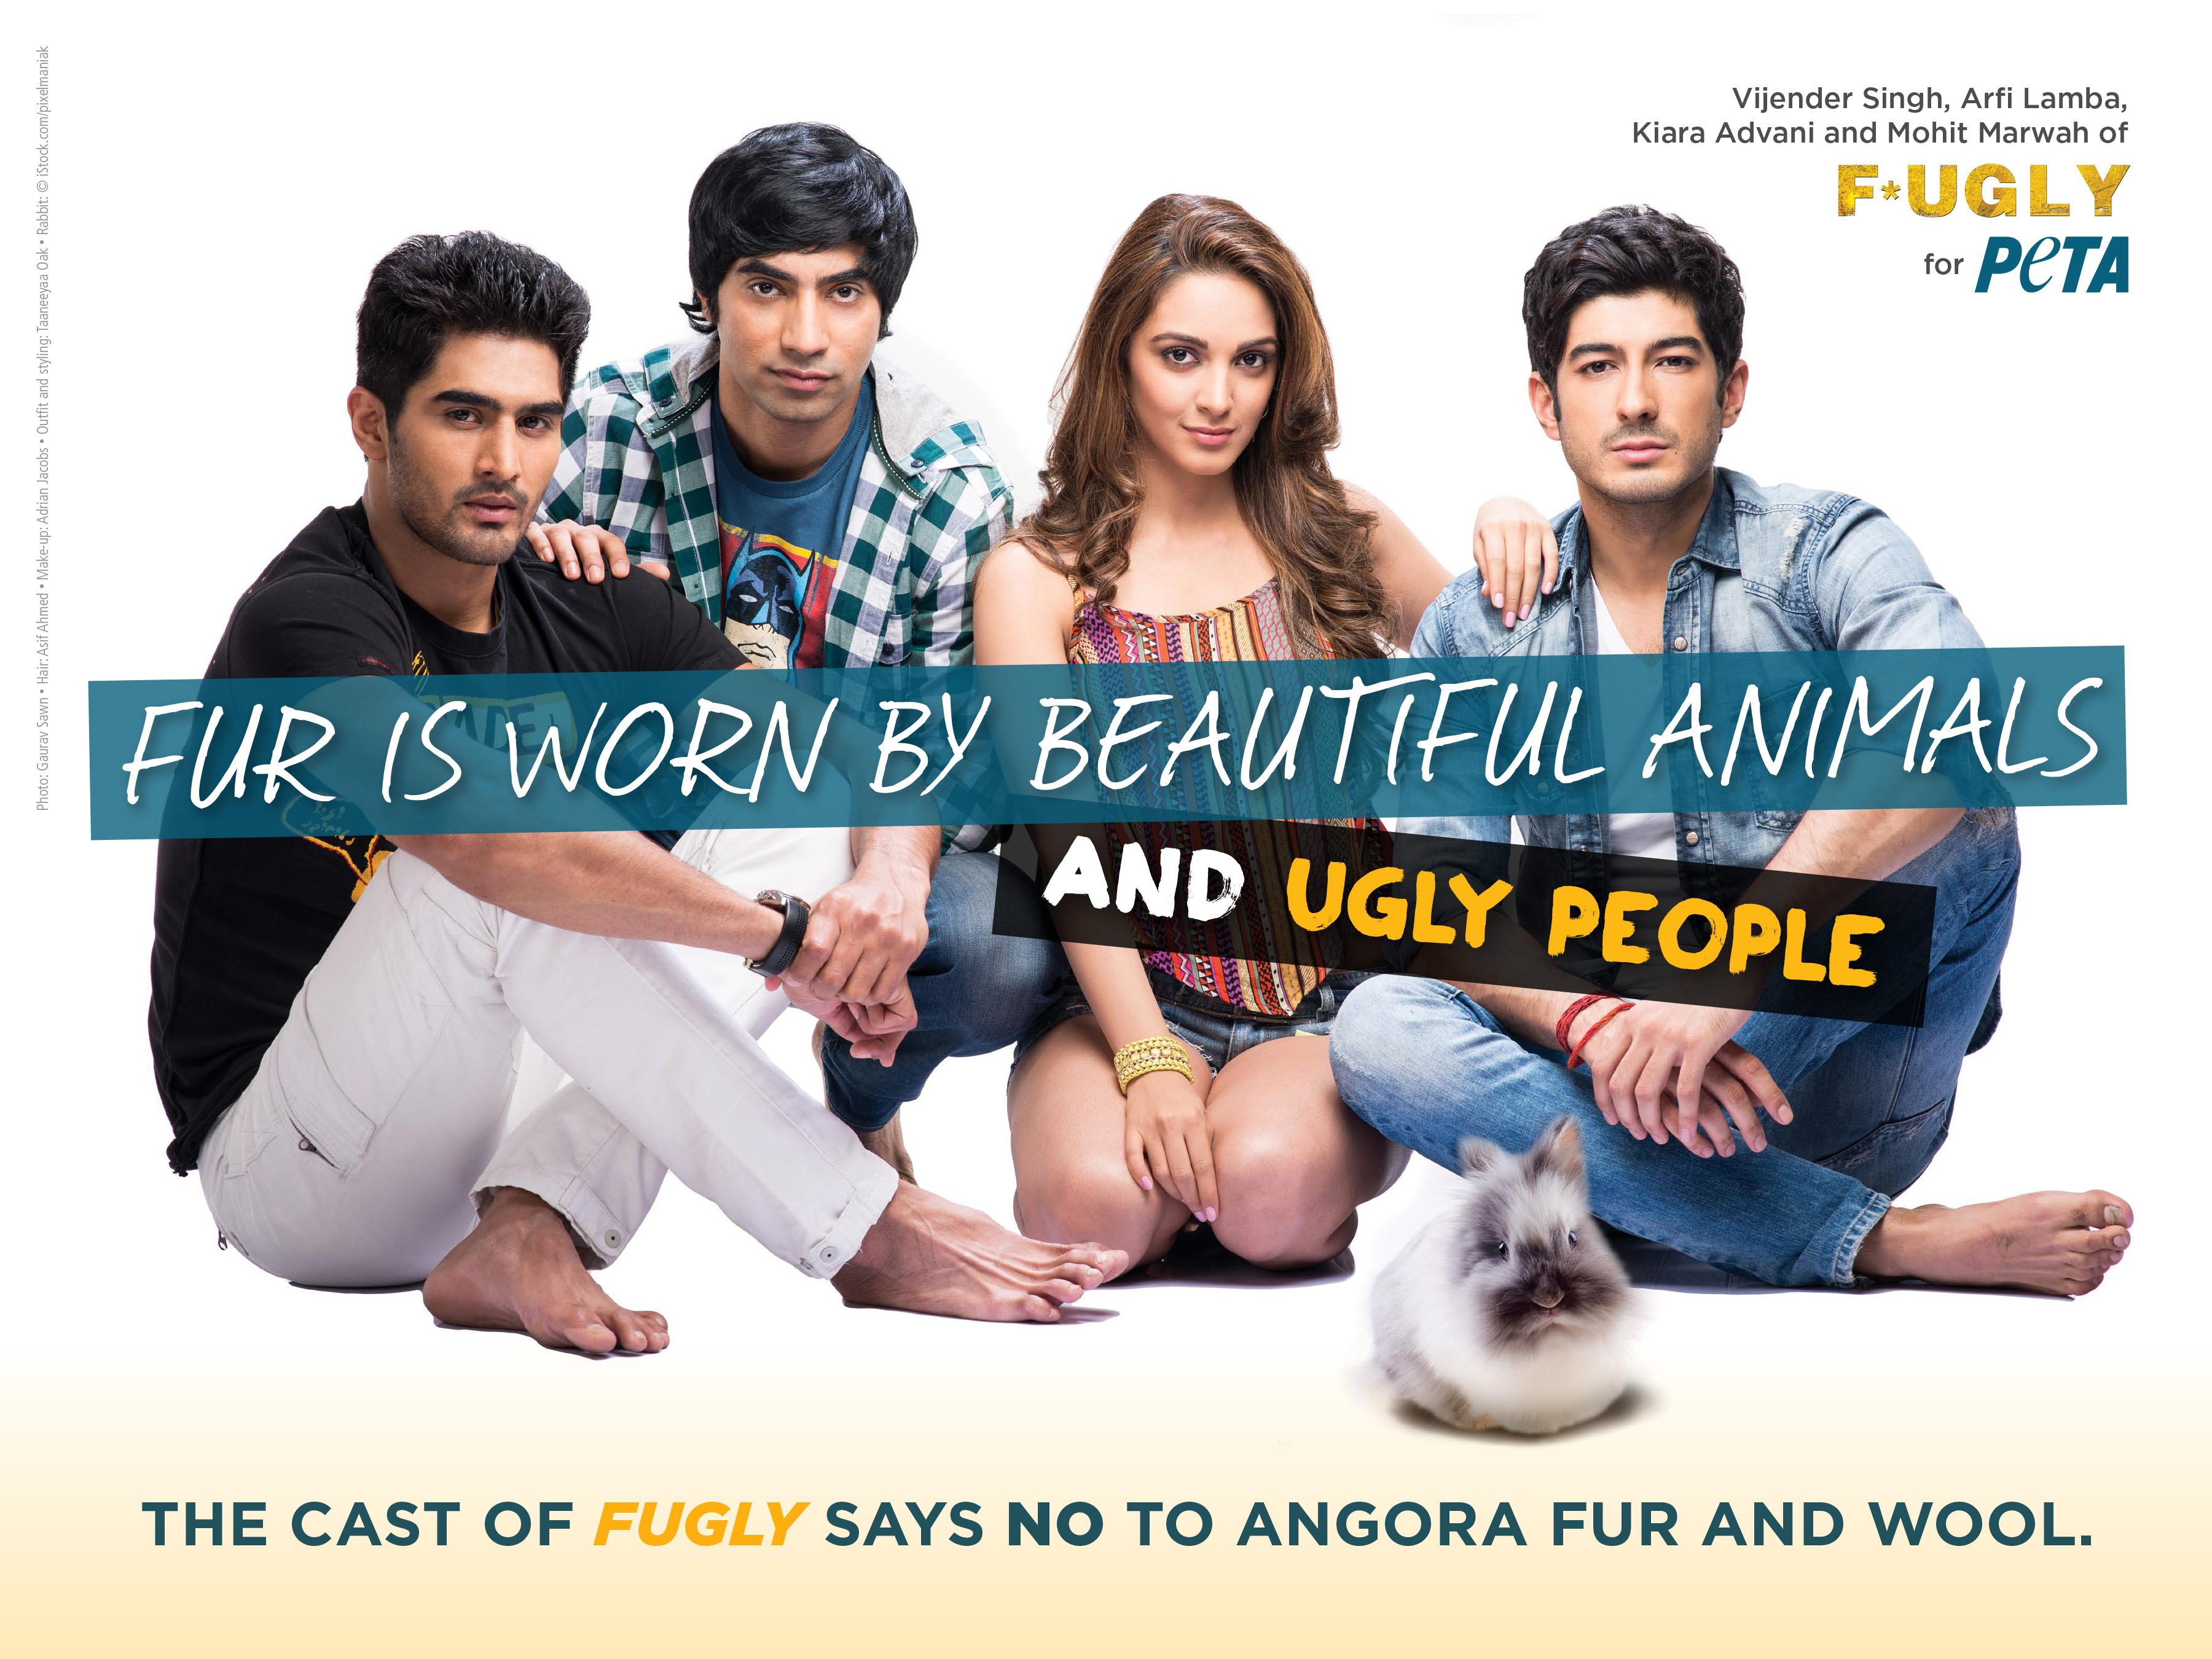 FUGLY Stars Says Fur Is Fugly